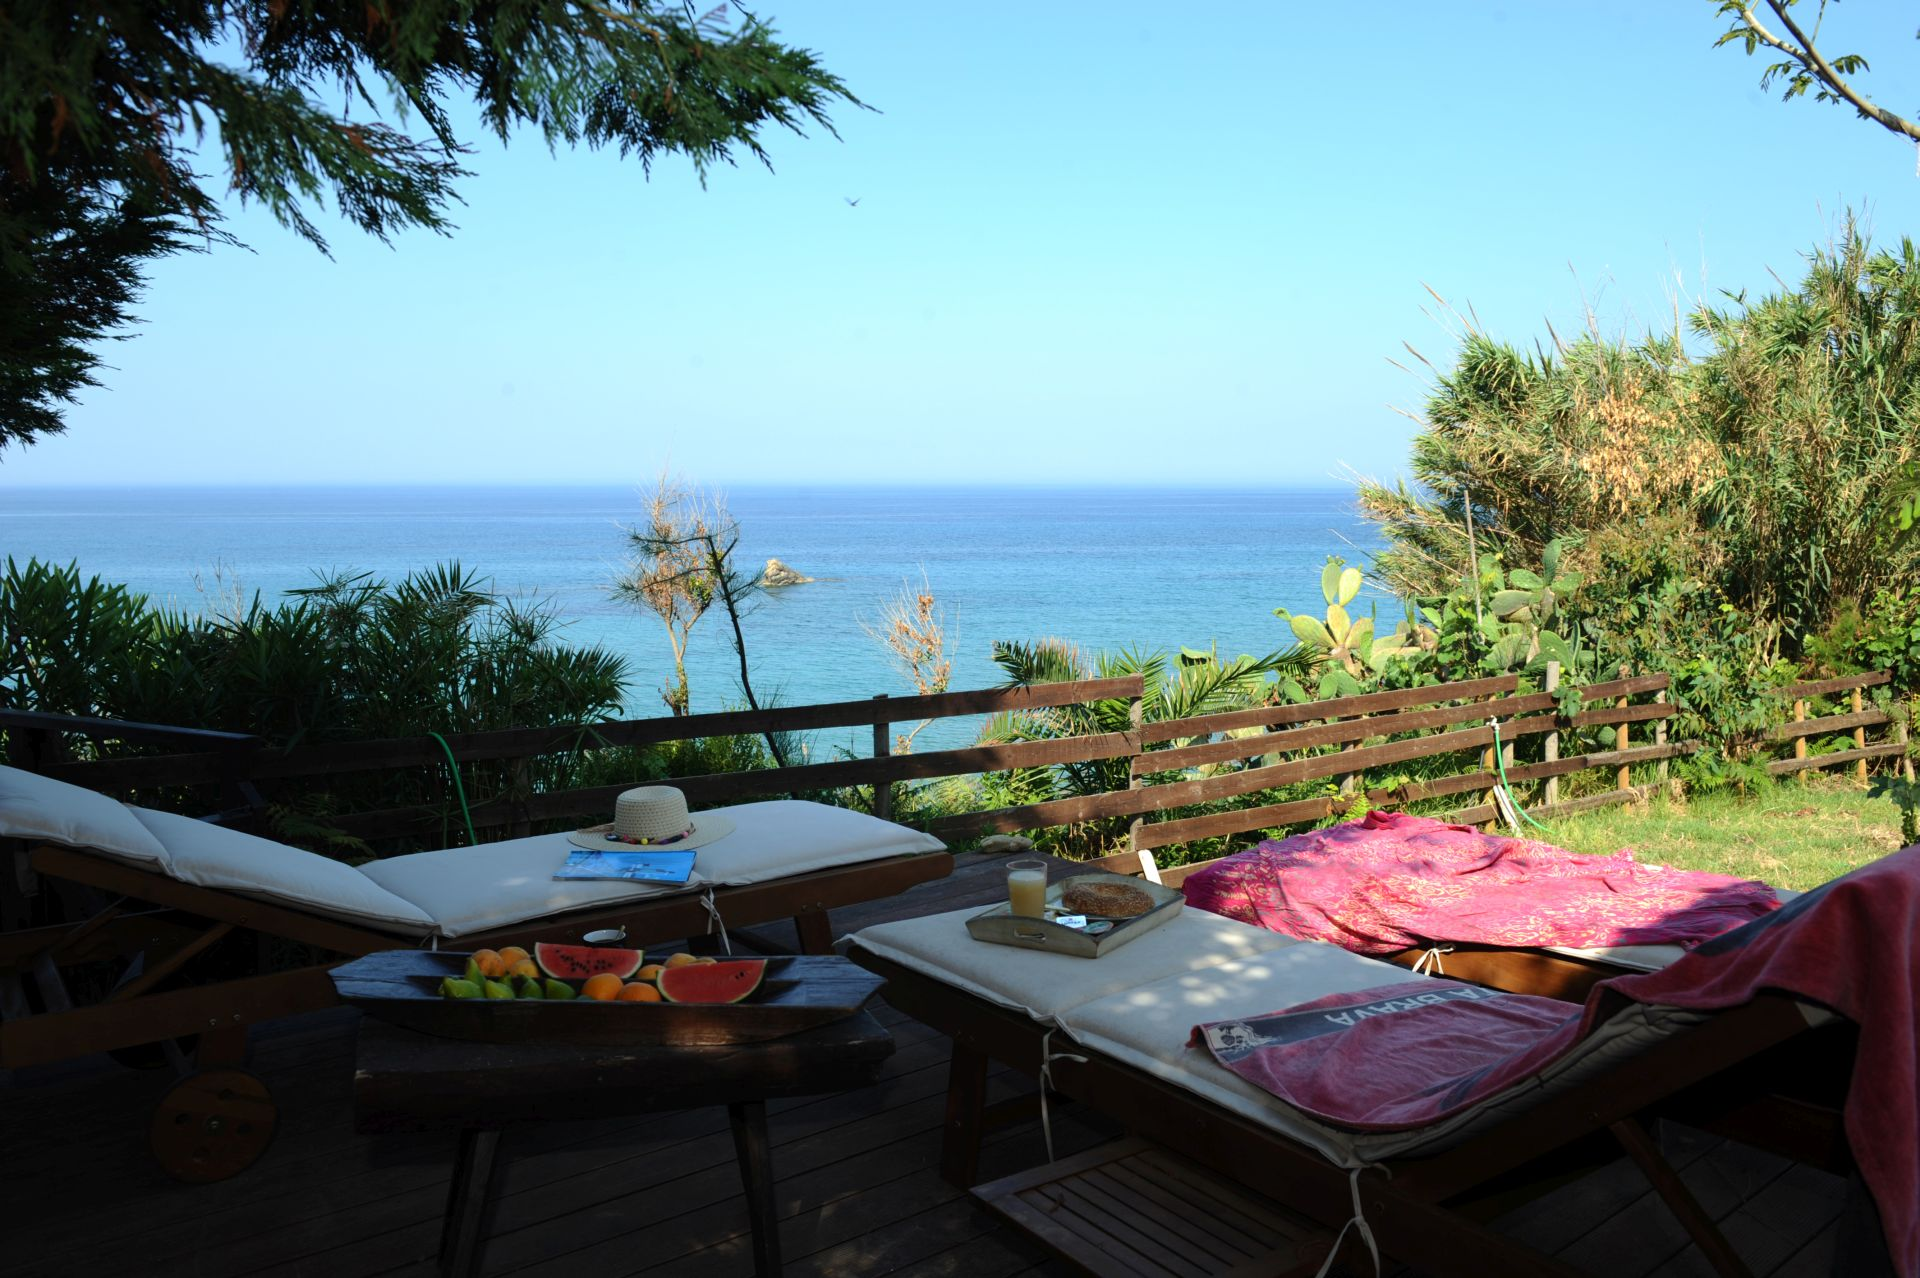 Sonnenbaden - Korfu Strandvilla Meliti, Kanouli, Agios Matheos, Korfu, KorfuCorfu